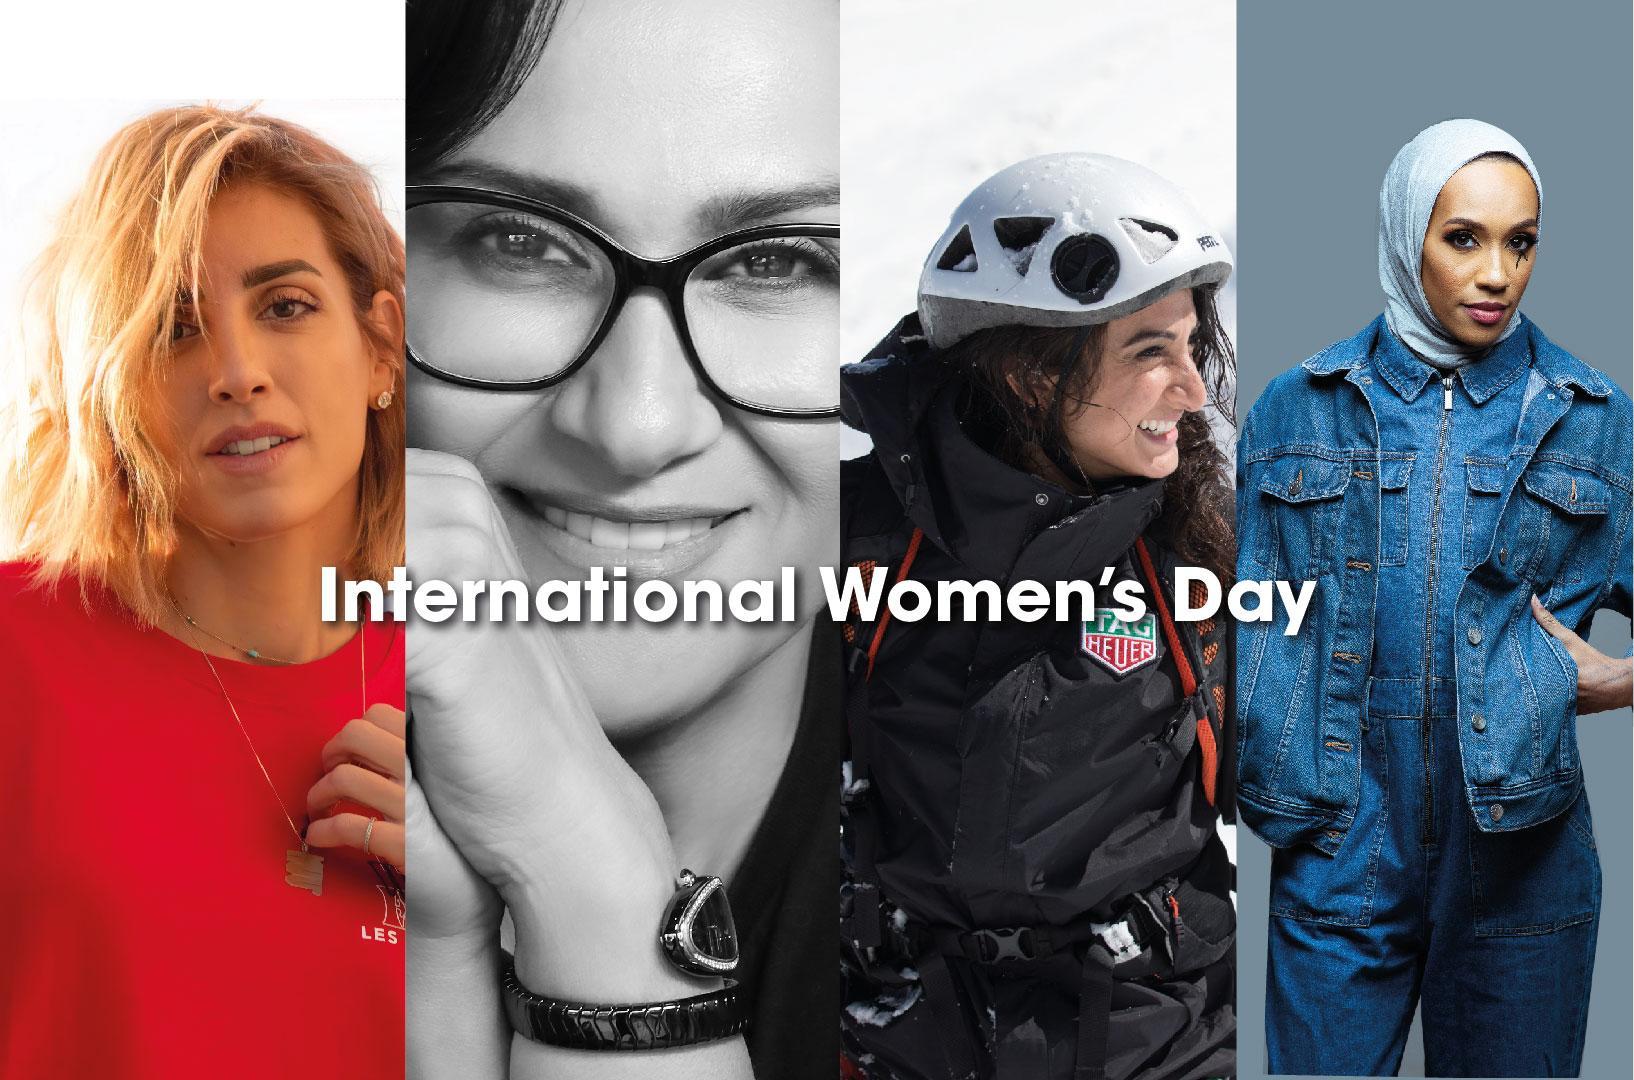 International Women's Day 2021 - News